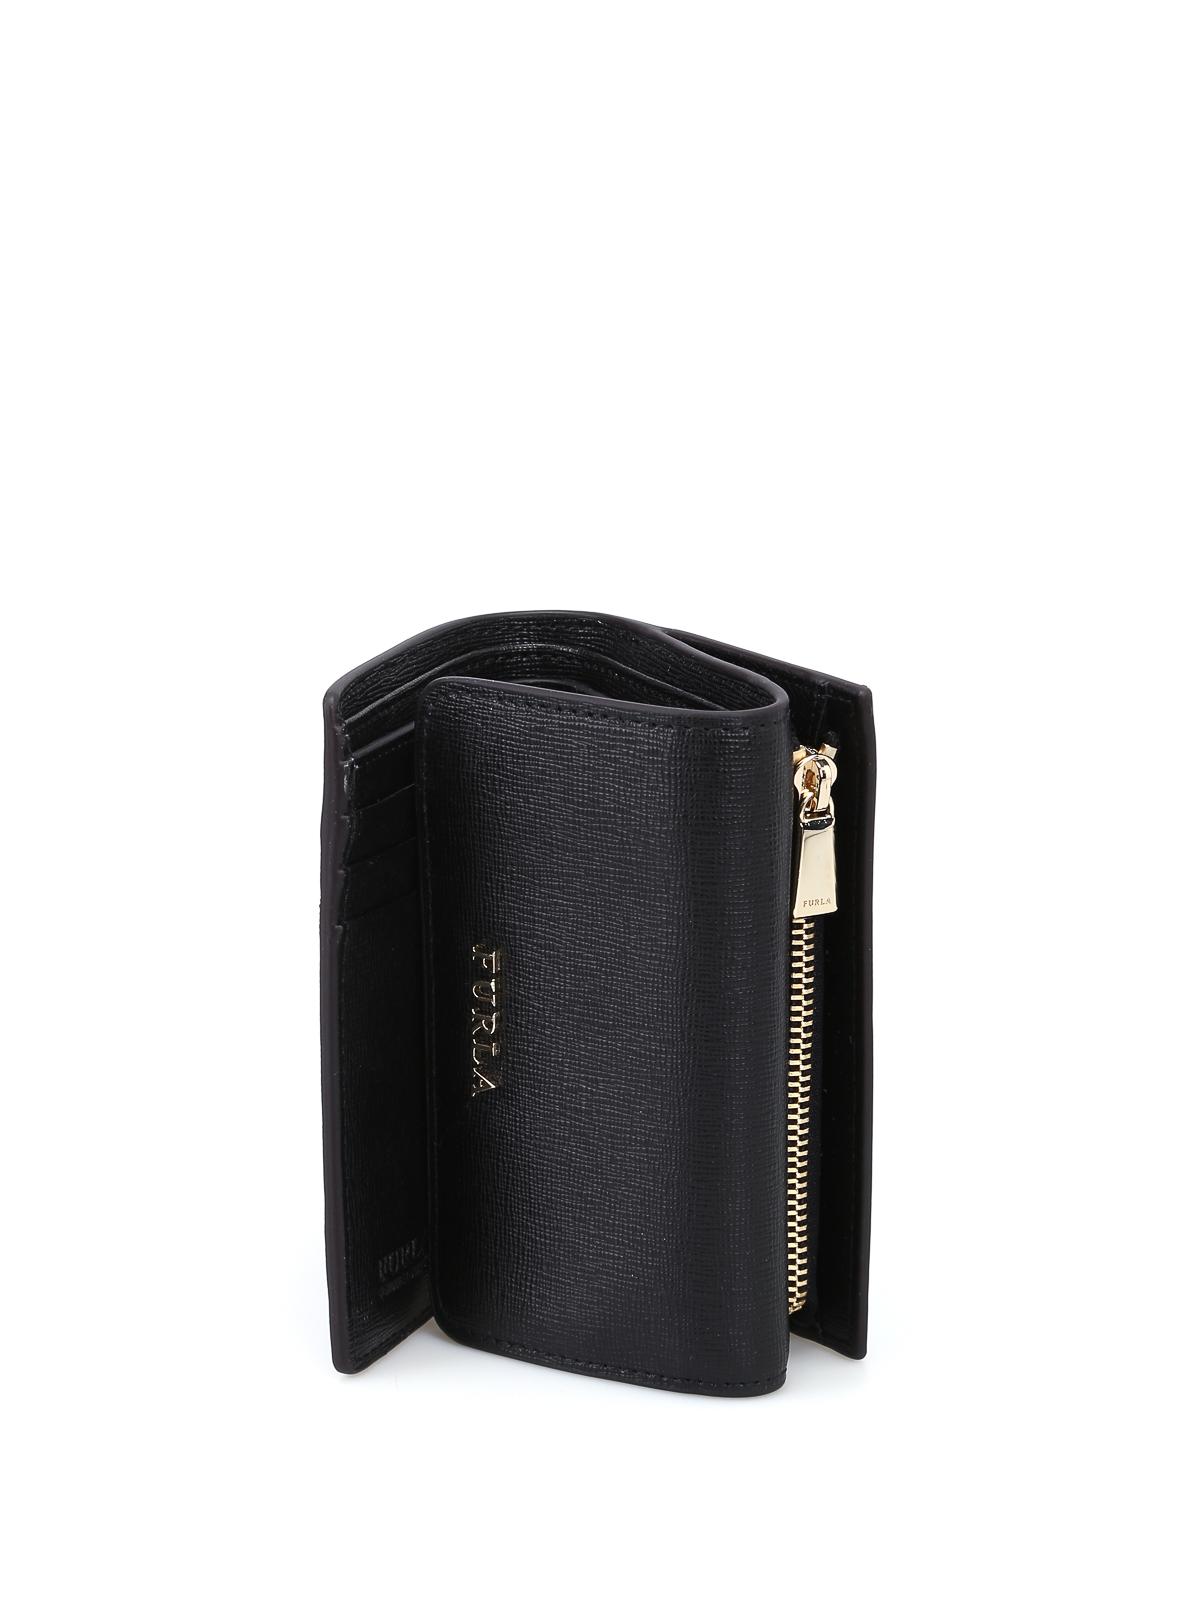 Furla - Babylon small trifold black wallet - wallets   purses - 872817 14fd5c563